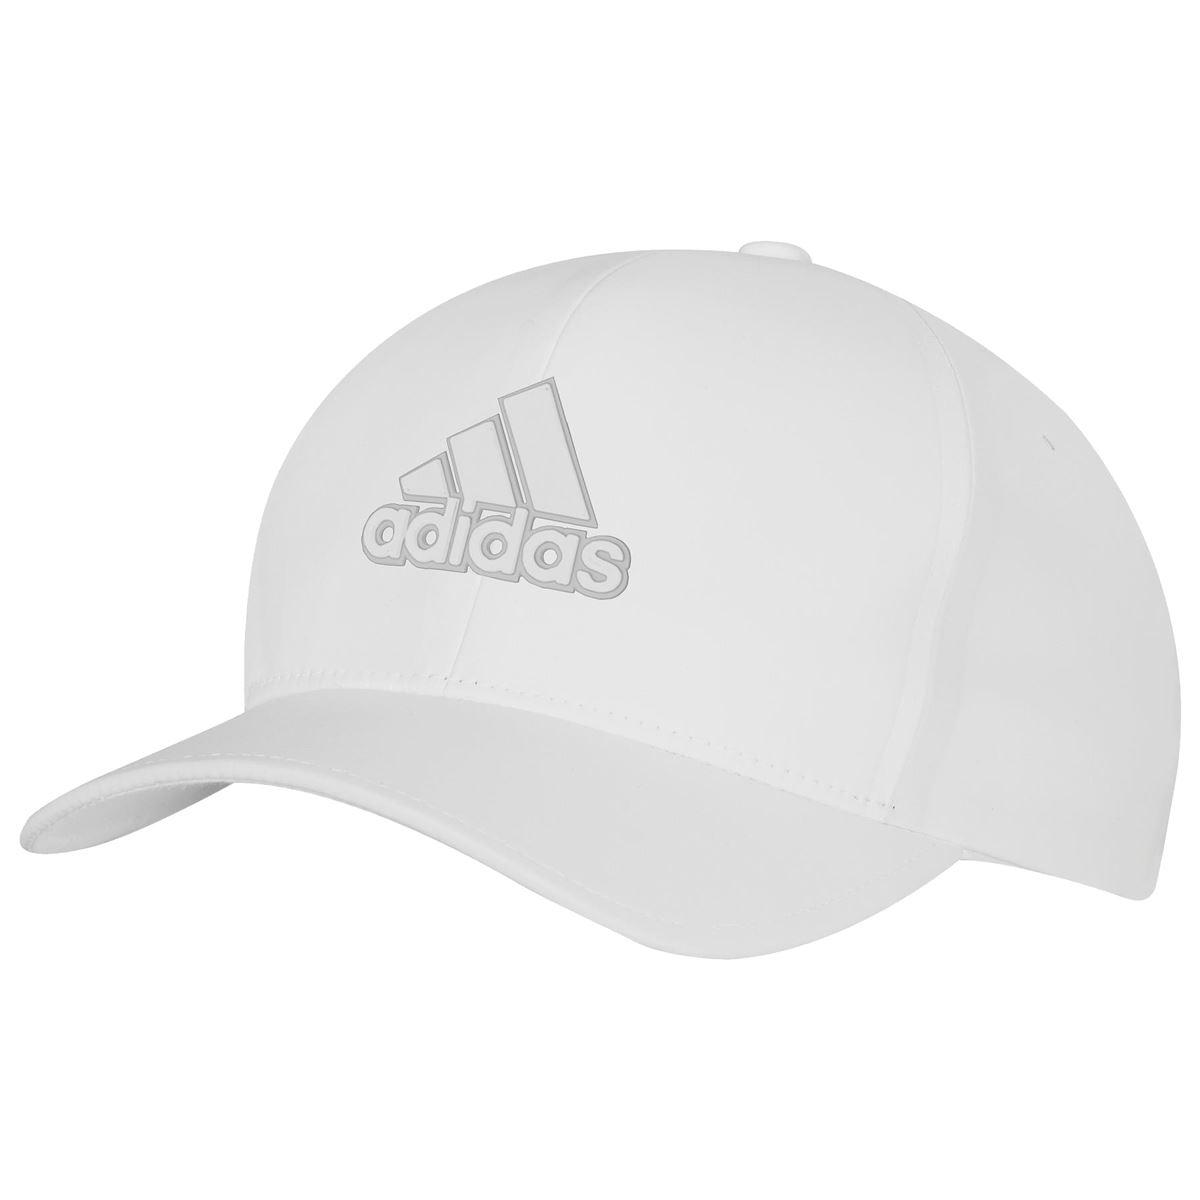 20709d19510 ... adidas hat ebay ...